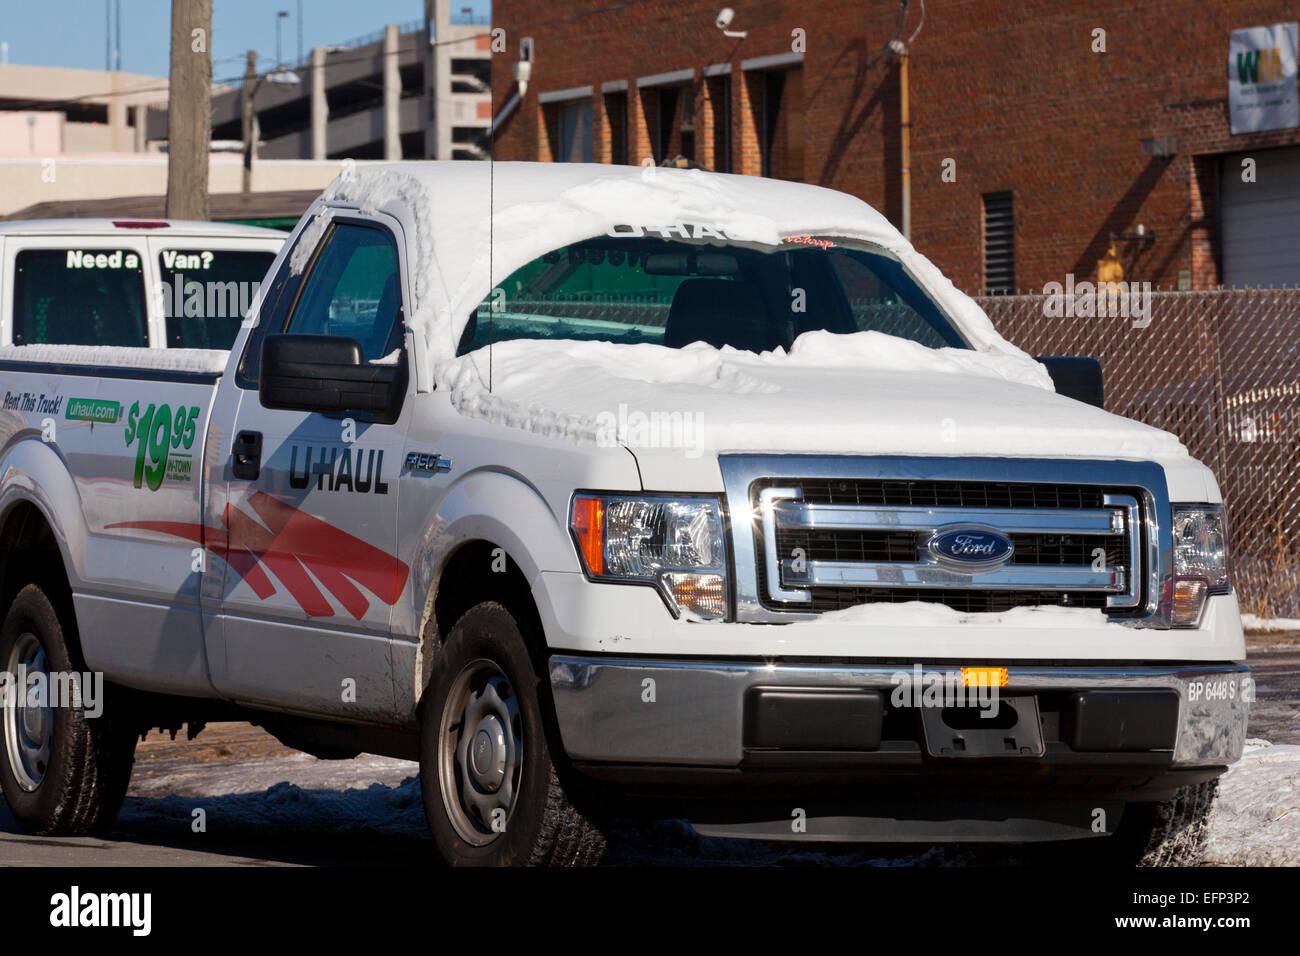 Uhaul - U Haul Pickup Truck In Winter Usa Stock Image